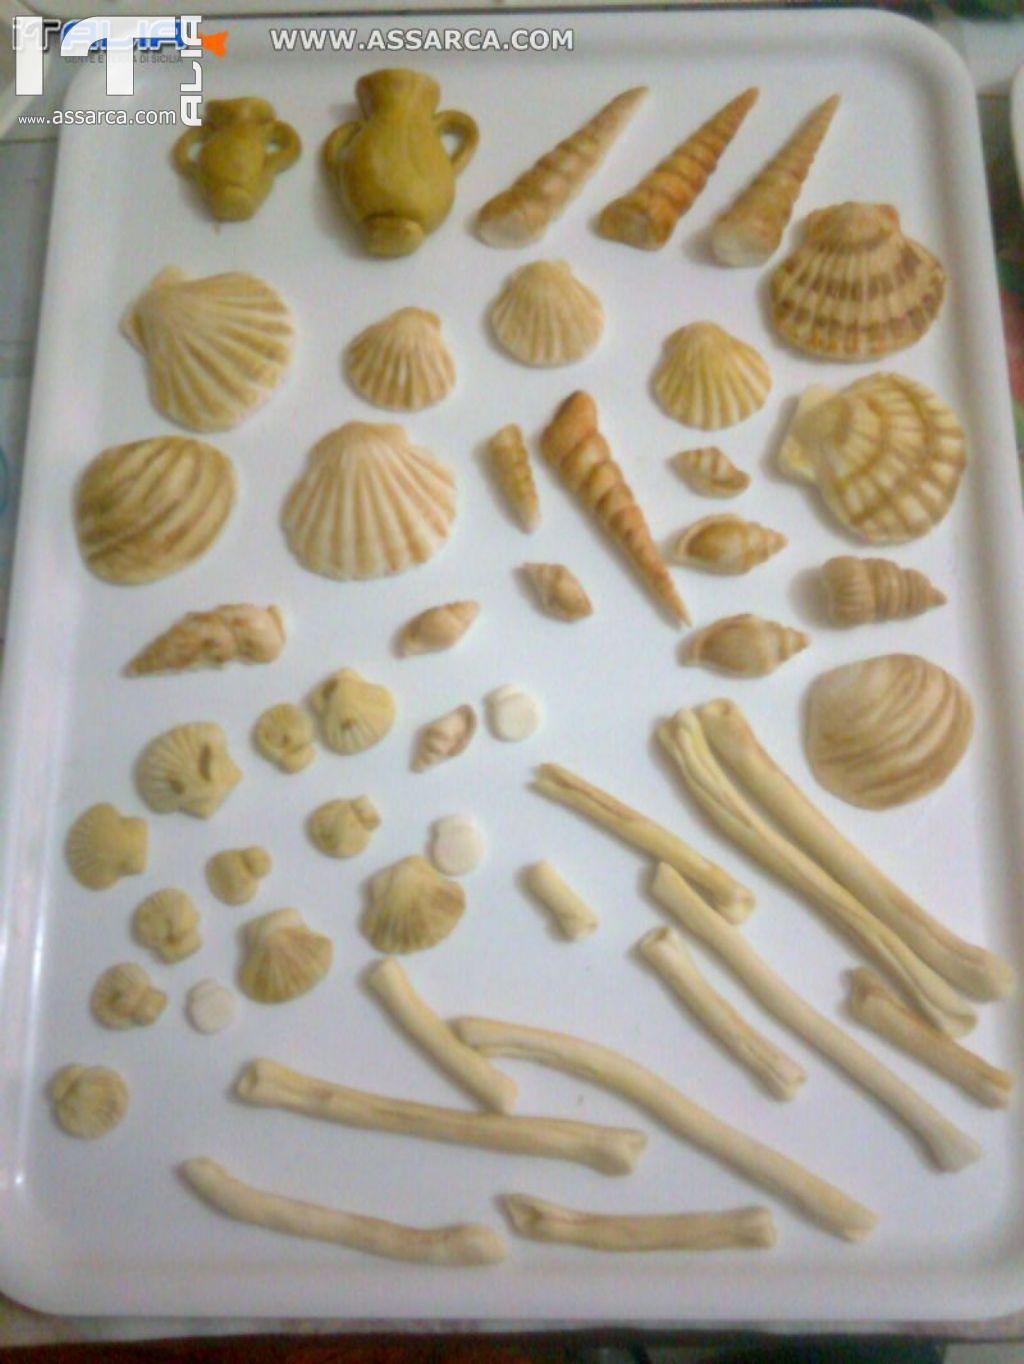 Conchiglie decorazioni in pasta di zucchero for Pasta di zucchero decorazioni